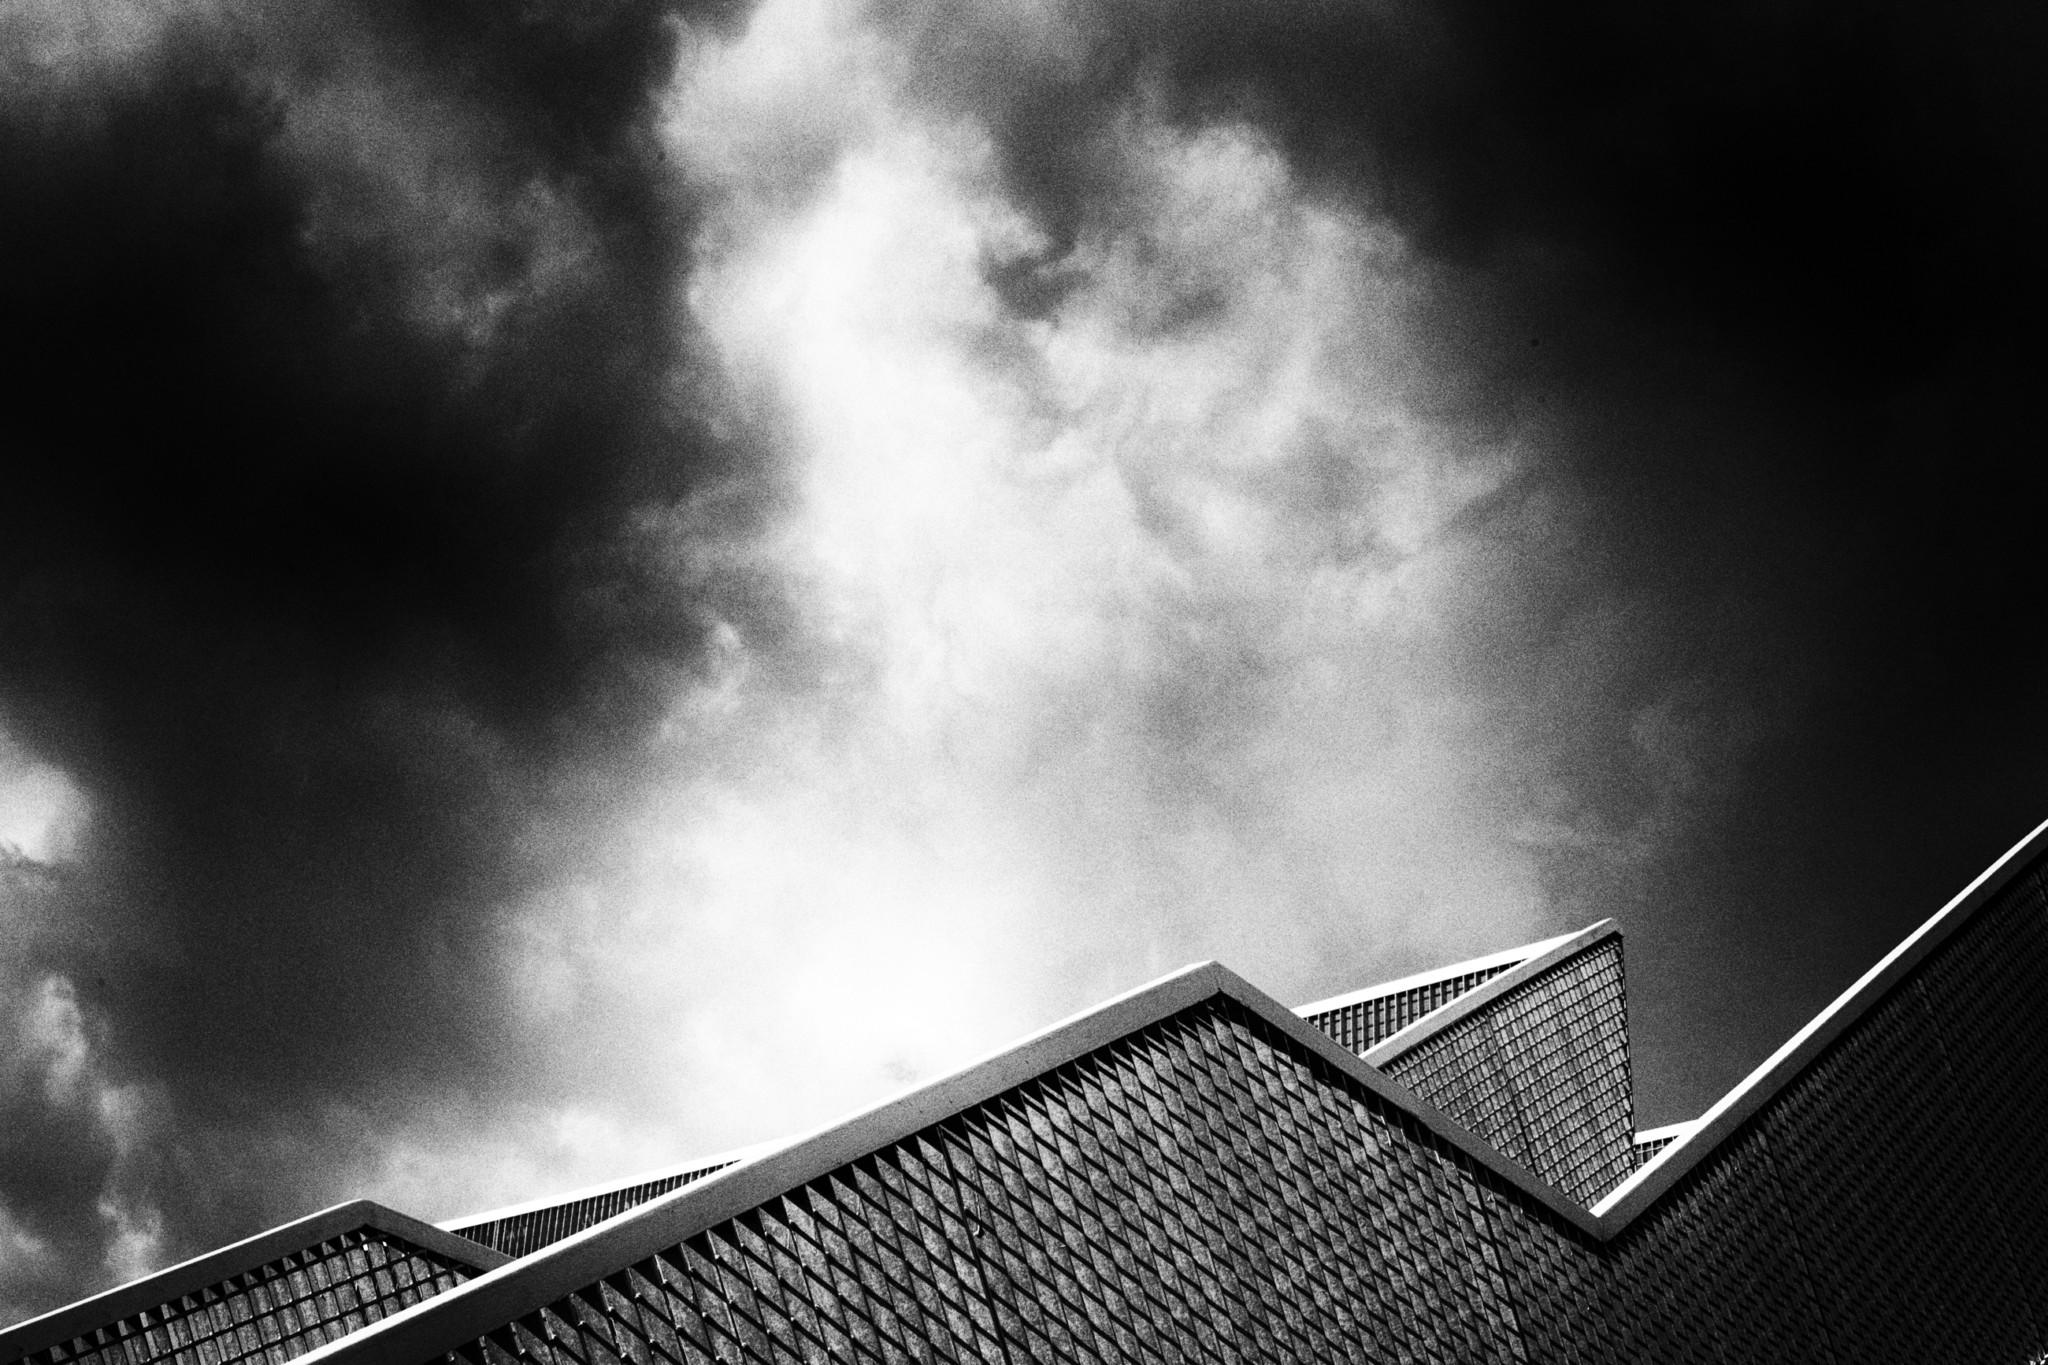 Merna El-Mohasel-Linie-Wolken-und-was-vom-Tag-übrig-blieb